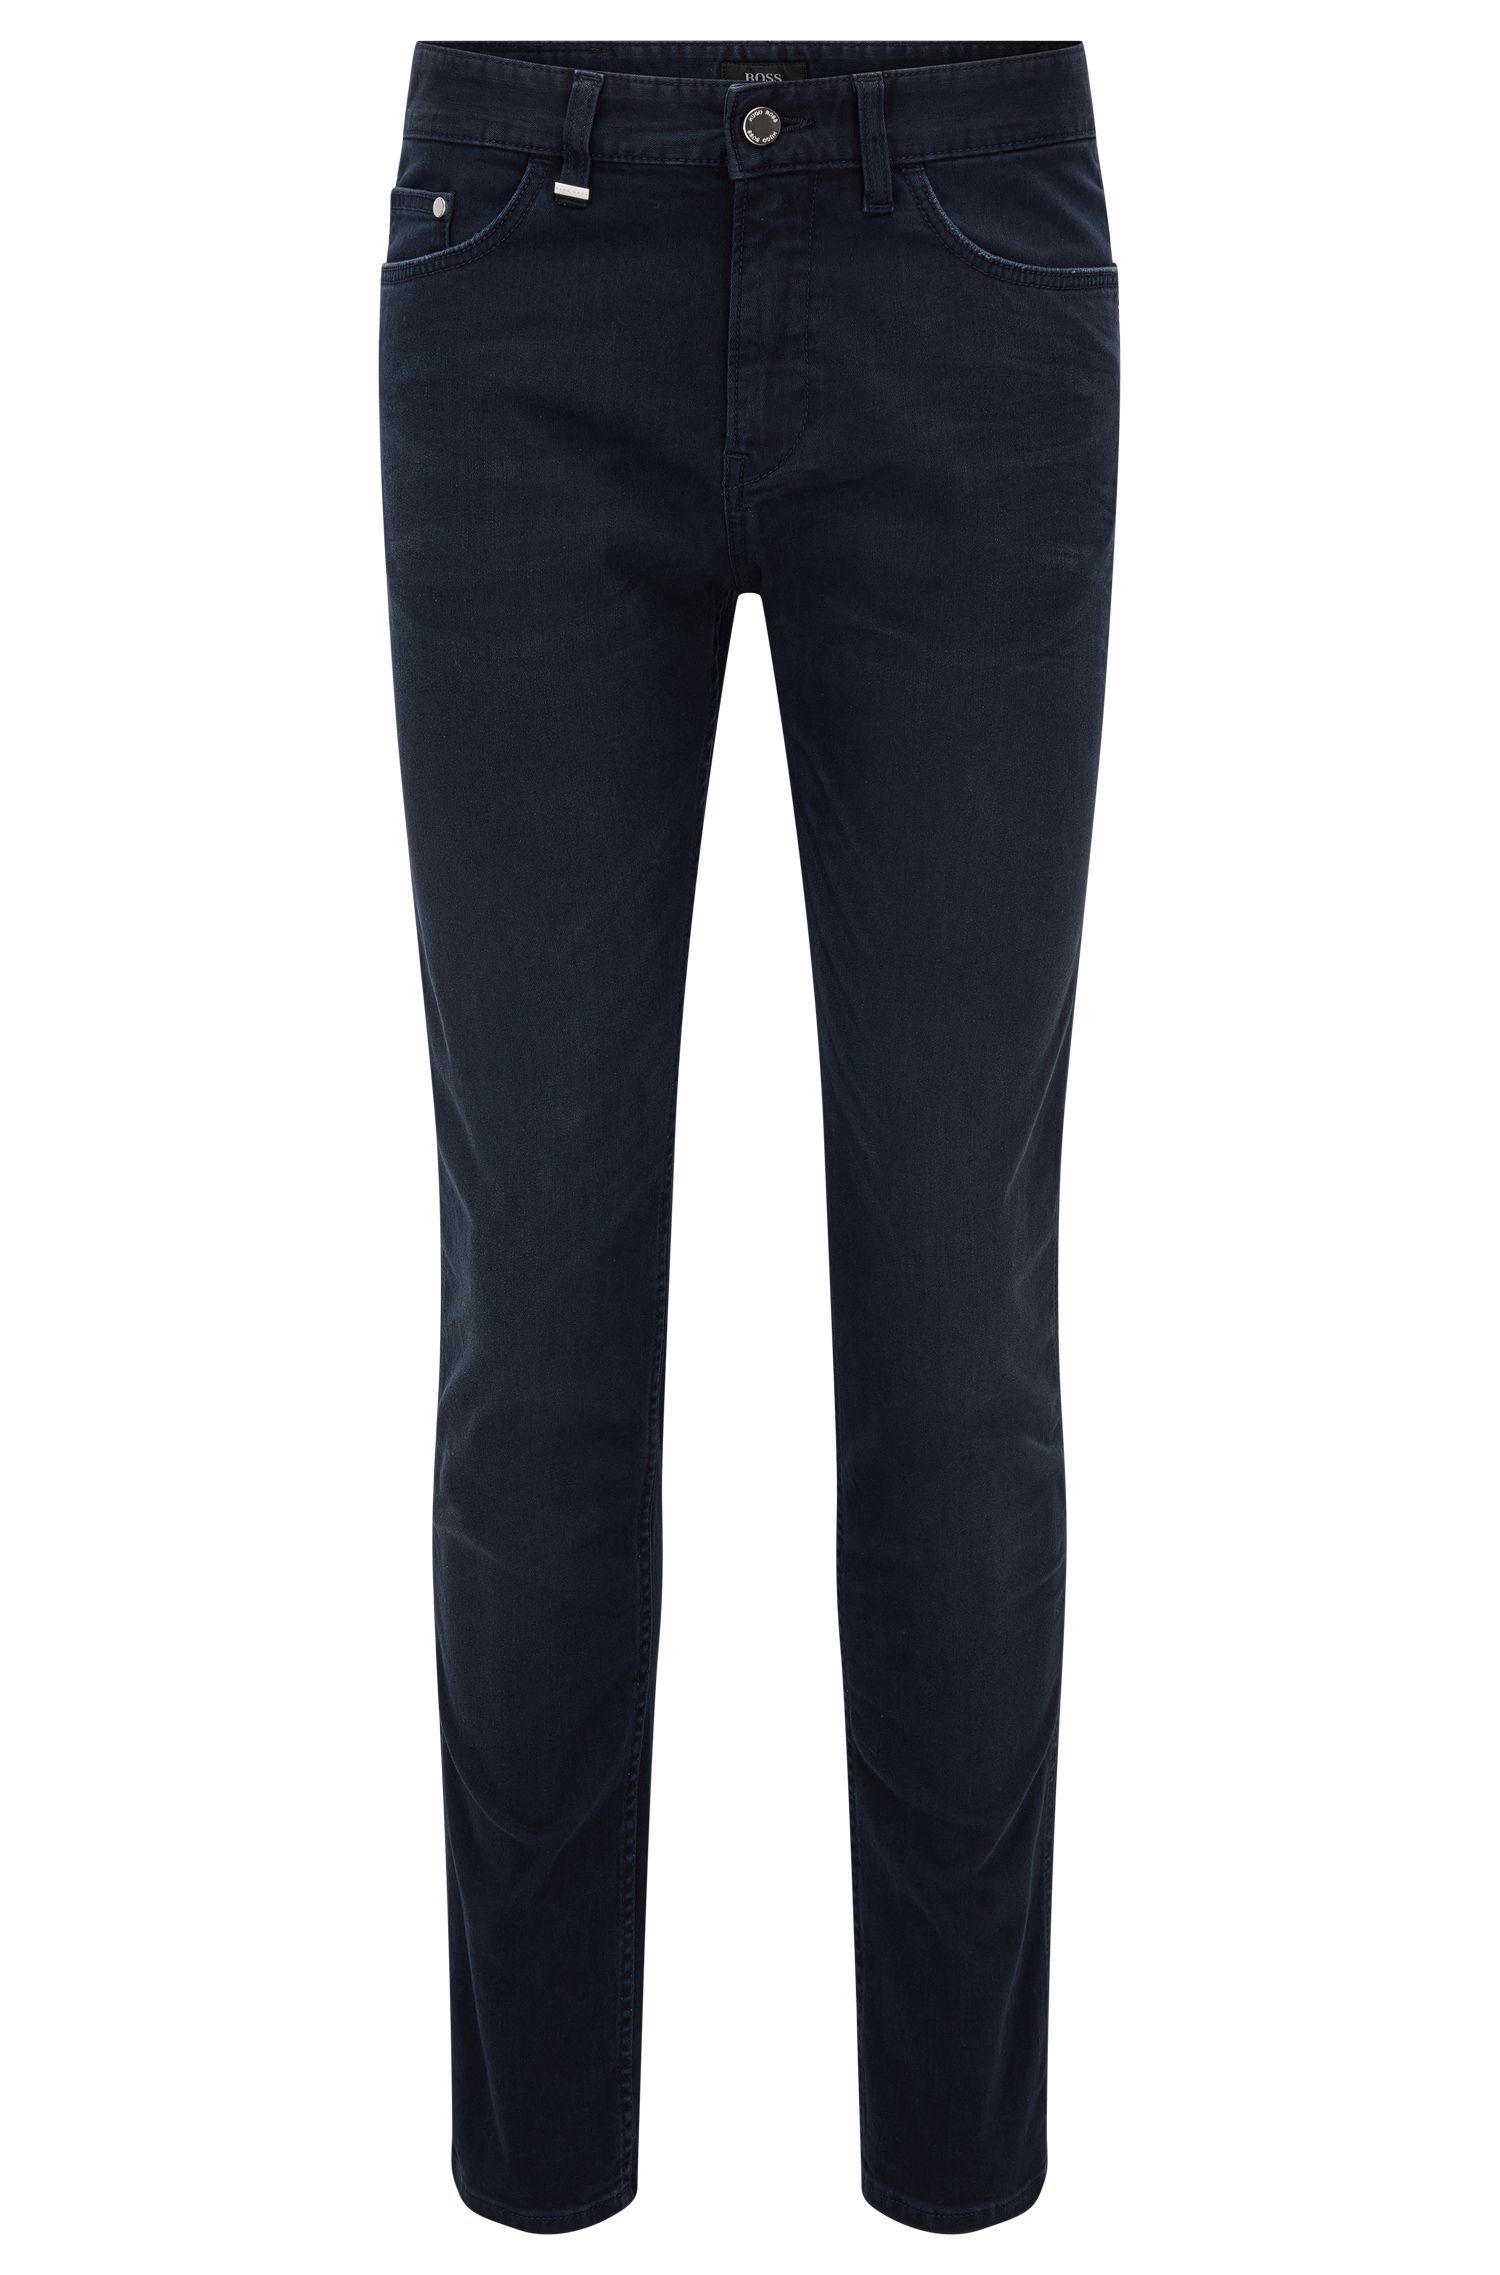 Jeans slim fit in denim elasticizzato blu-grigio